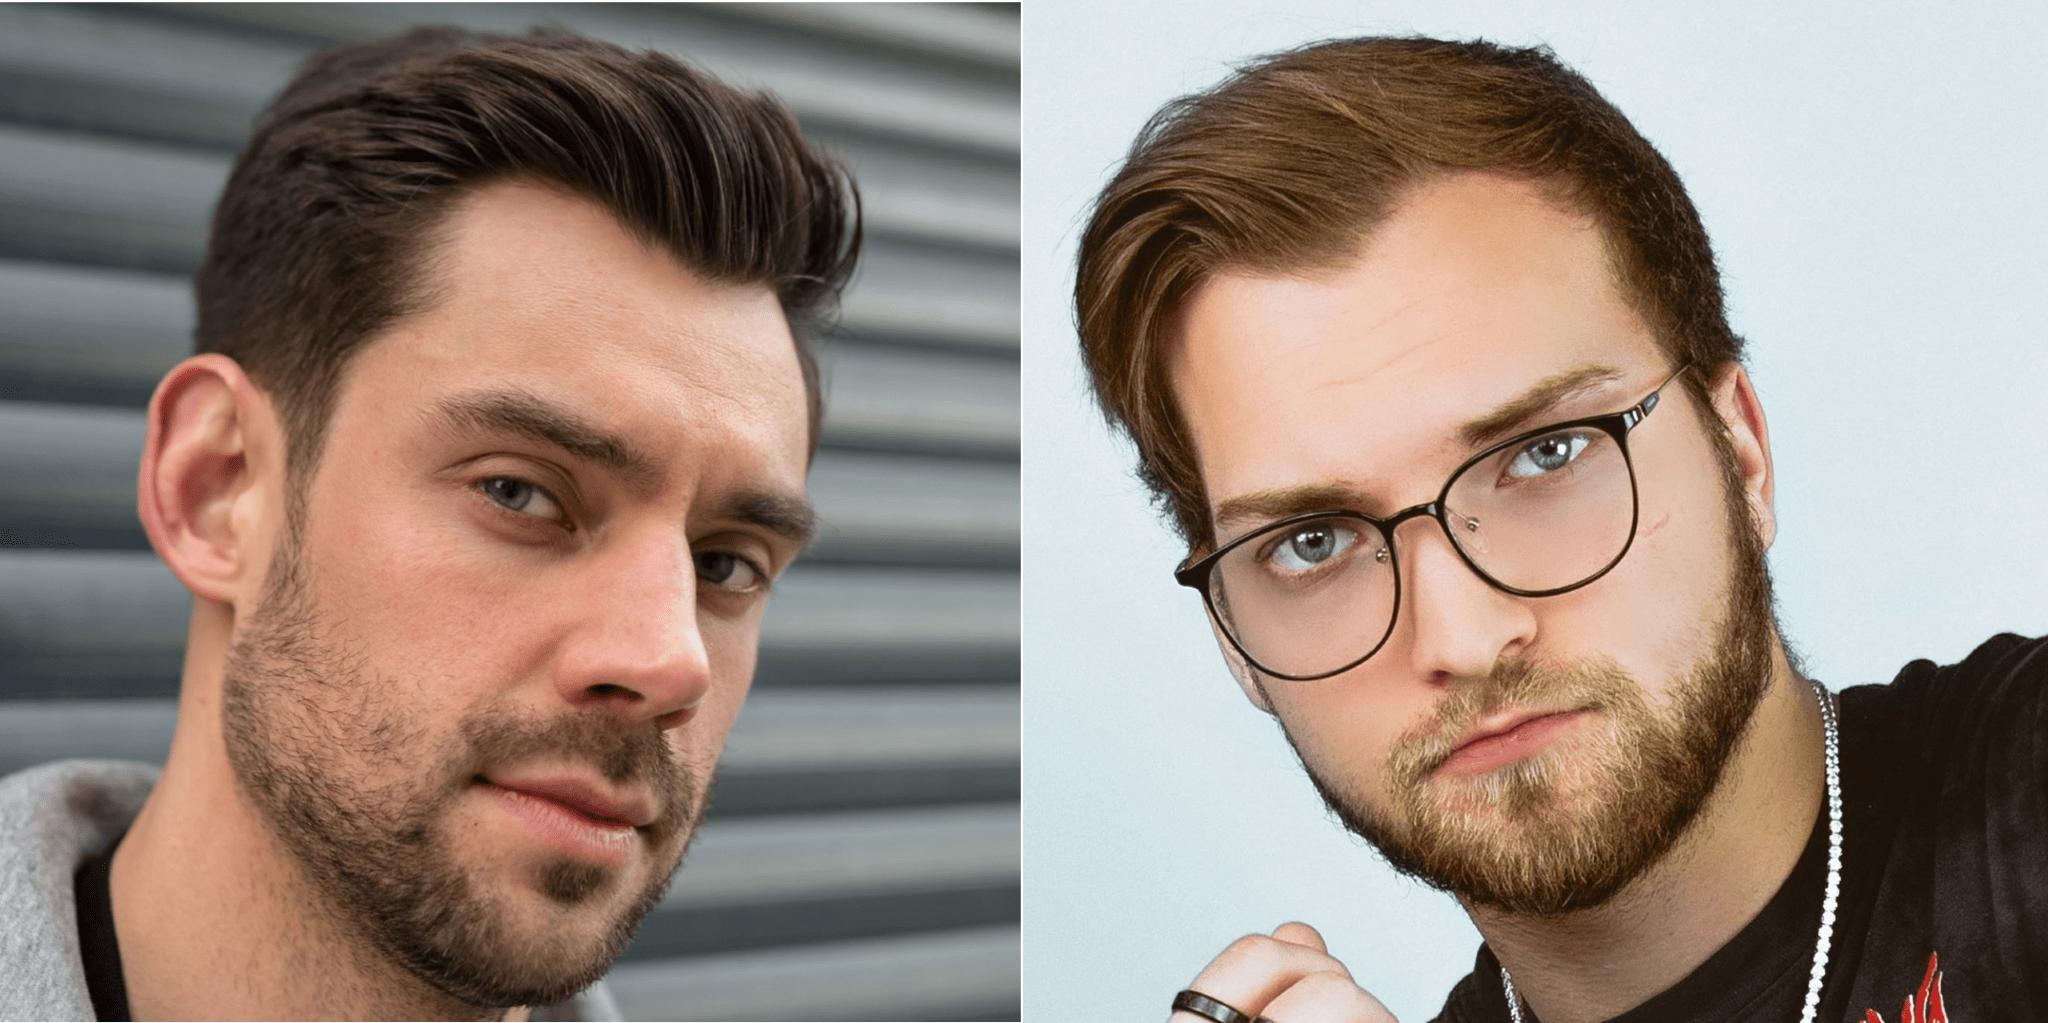 widow's peak vs receding hairline comparison